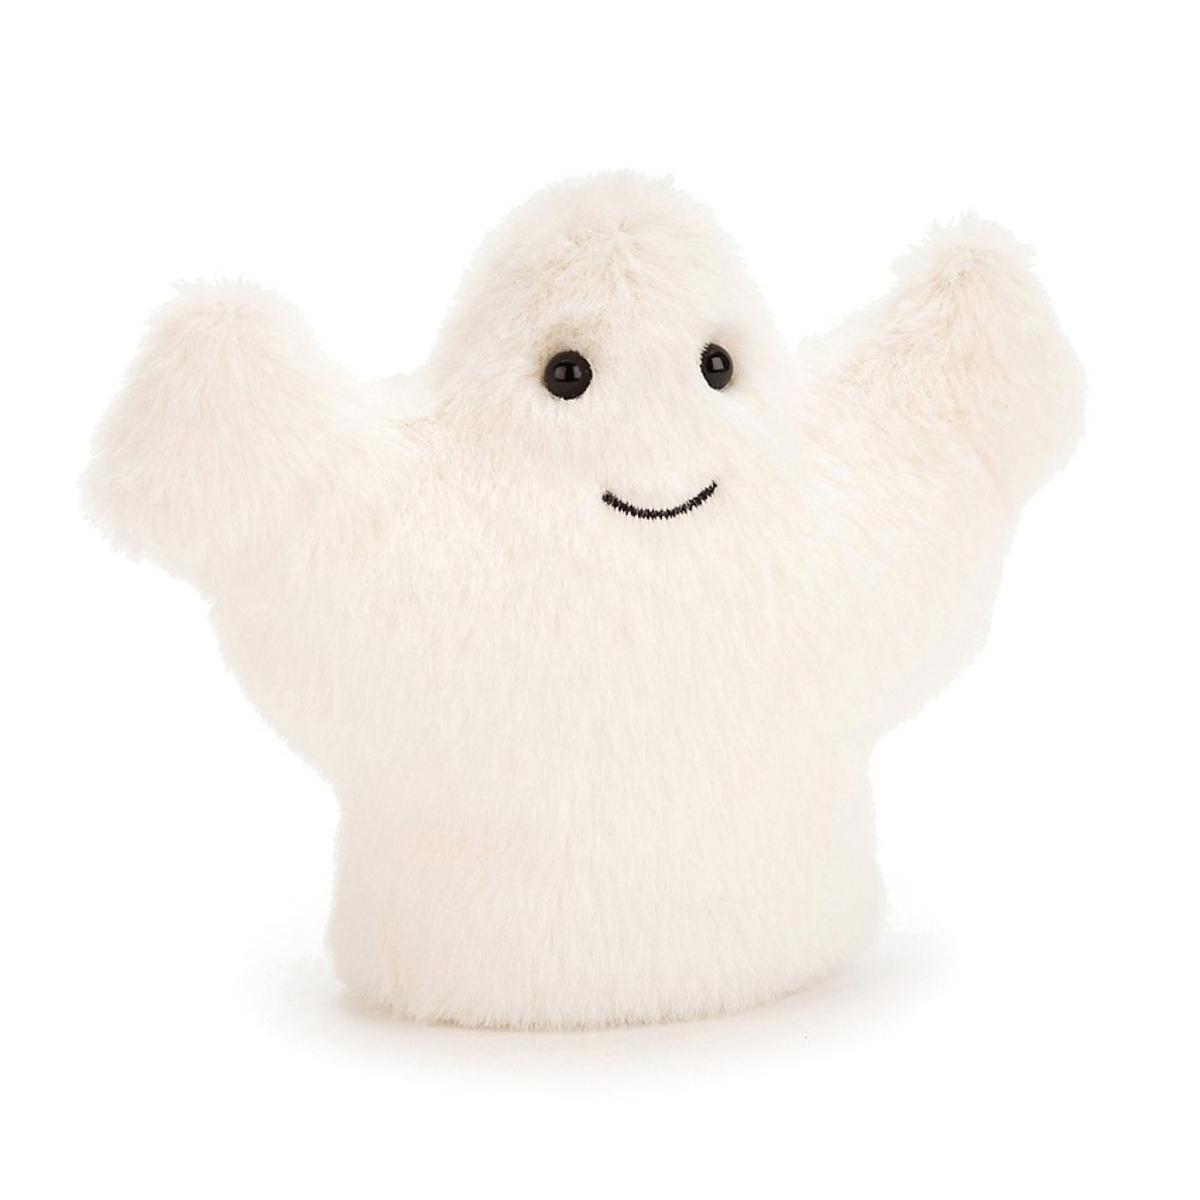 Peluche Fluffy Ghost Fluffy Ghost